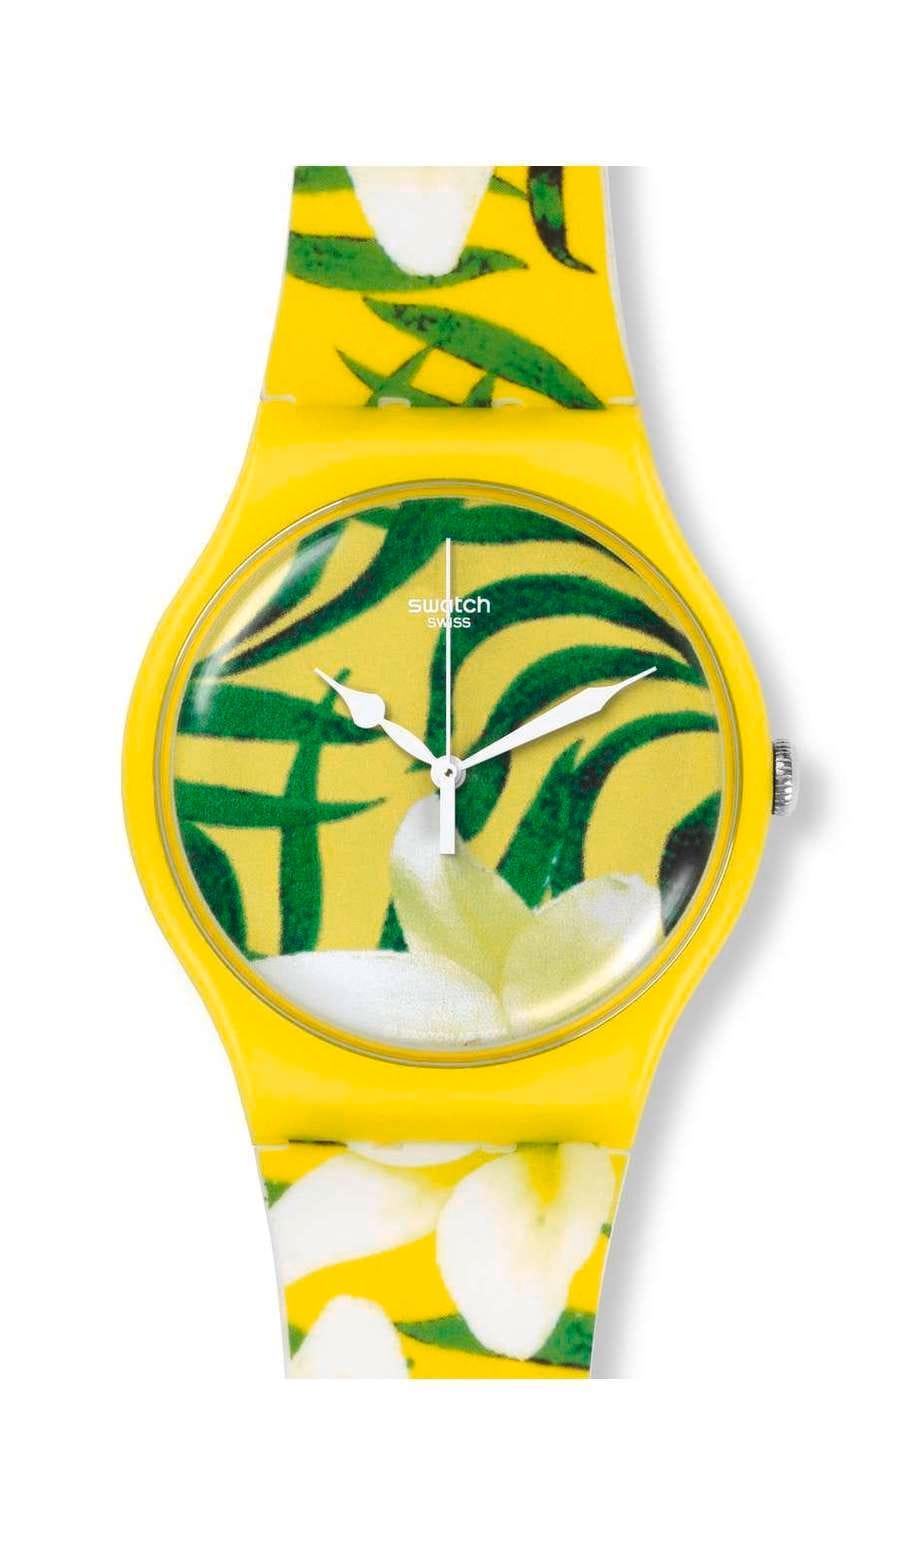 Swatch - LIMBO DANCE - 1